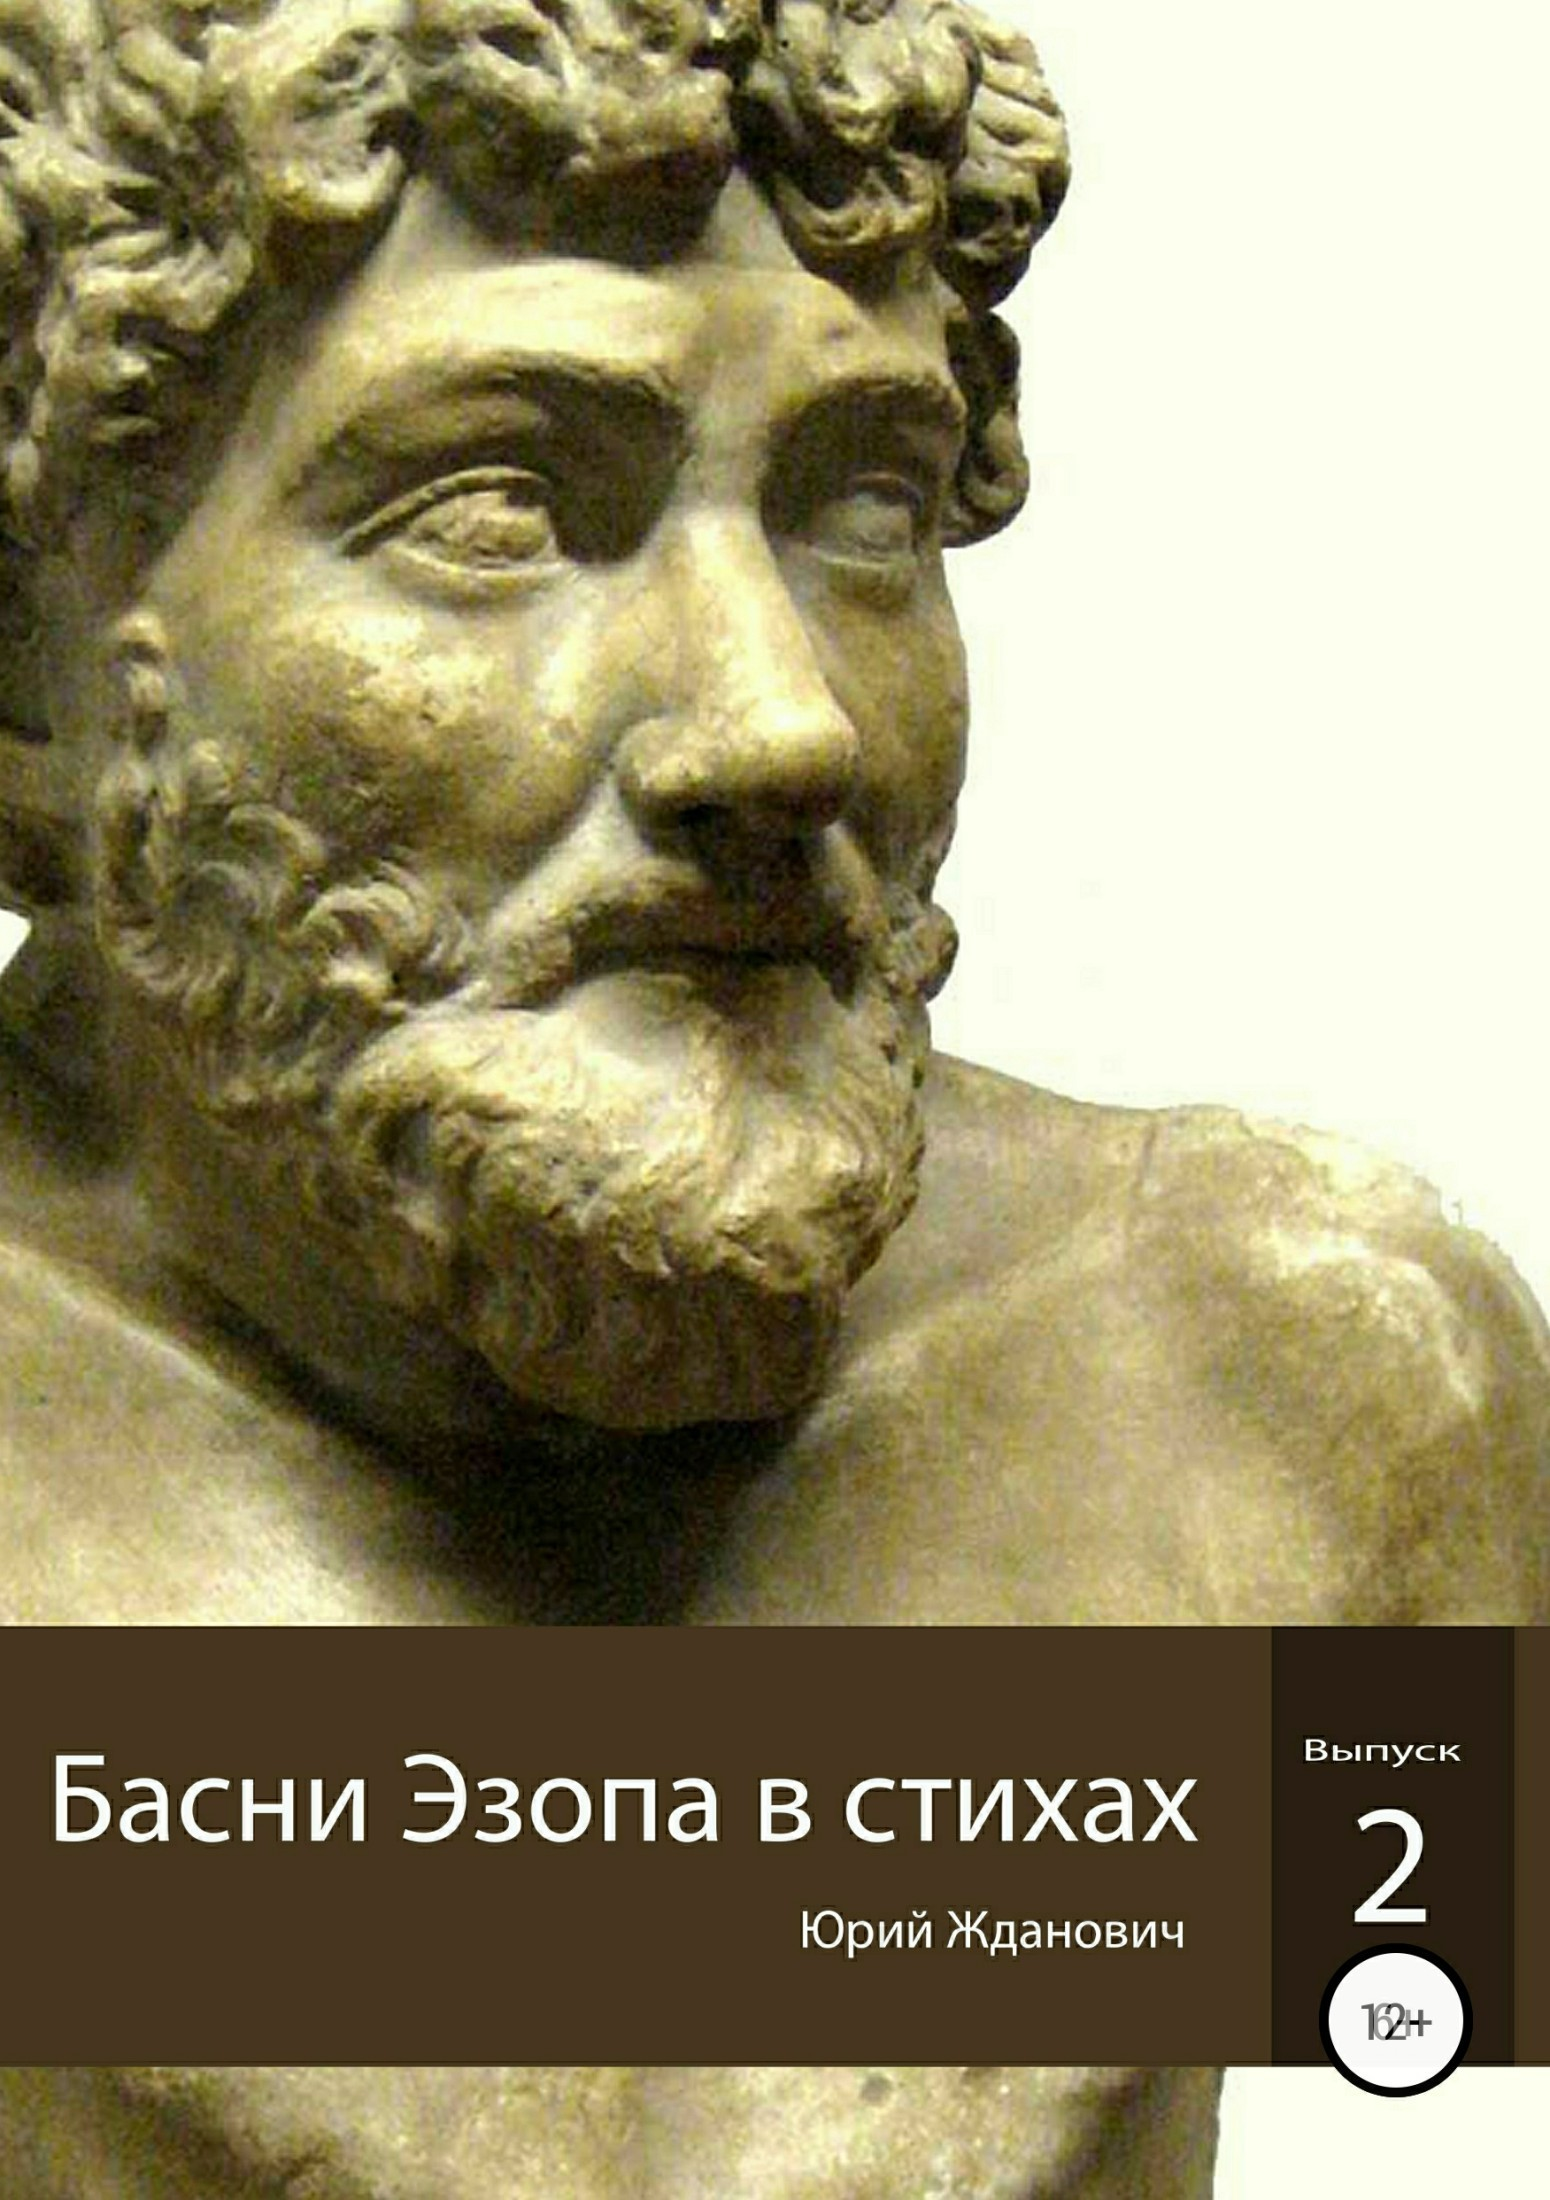 Юрий Михайлович Жданович Басни Эзопа в стихах. Выпуск 2 мастер класс басни с моралью